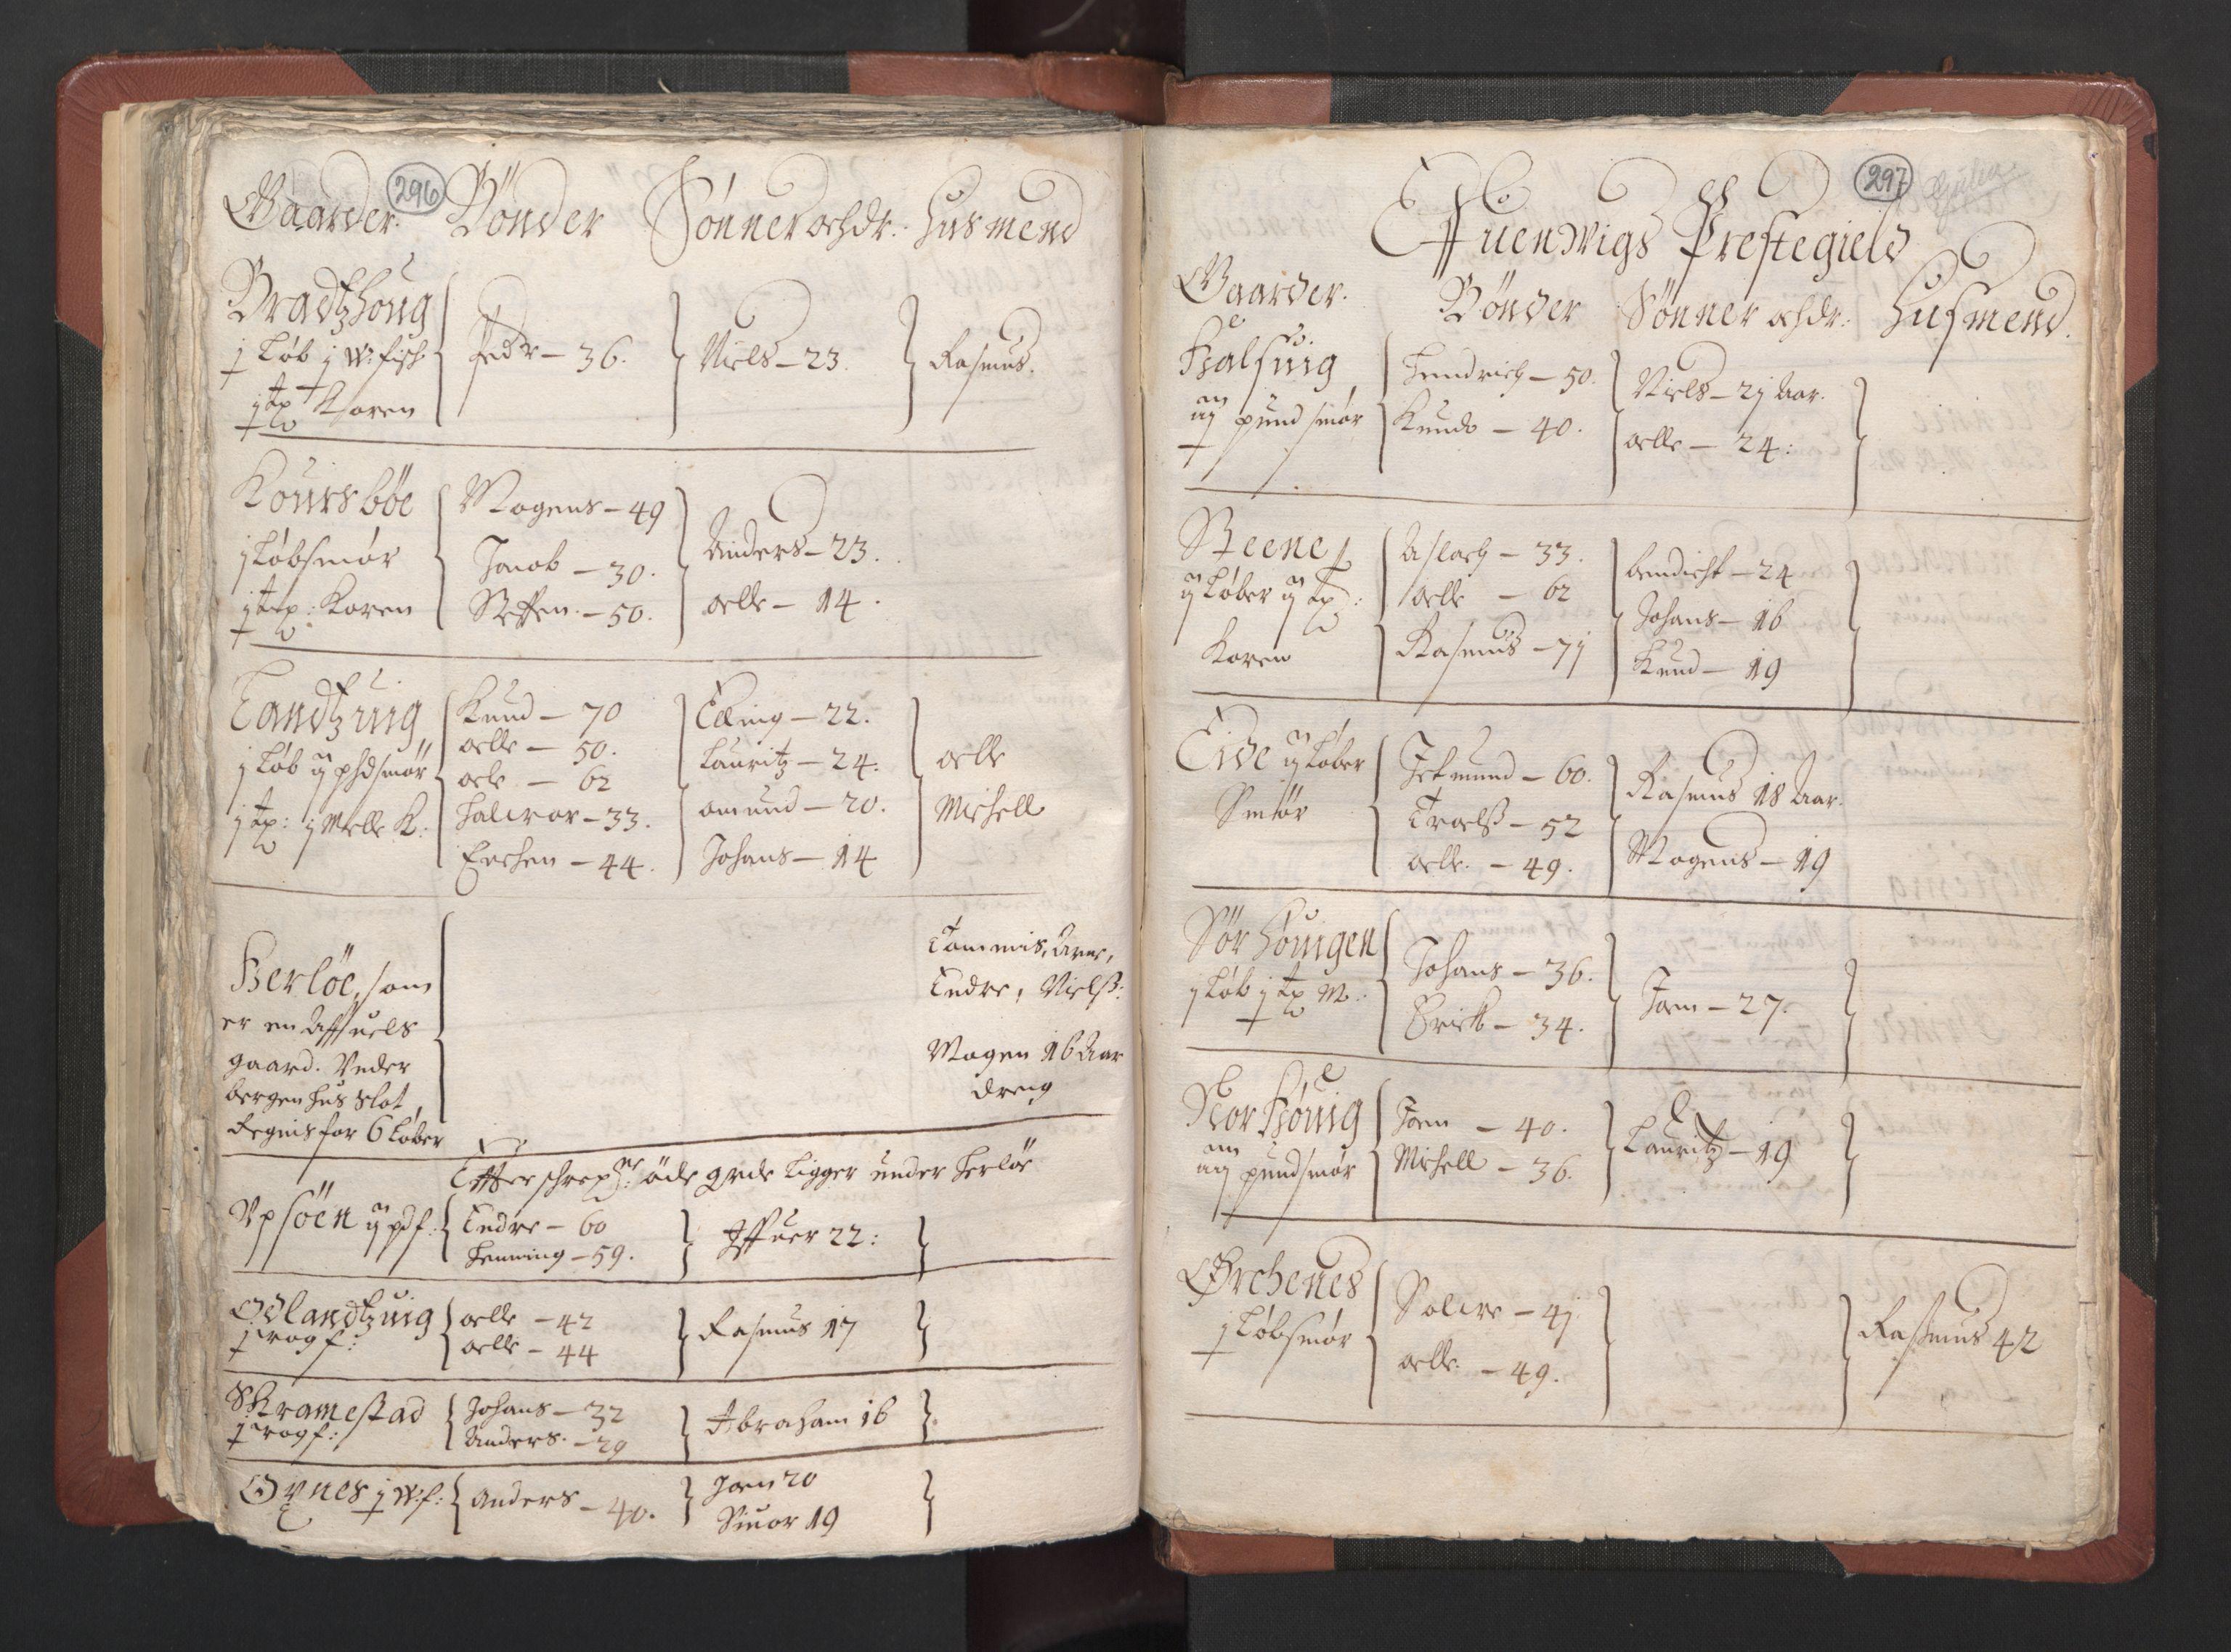 RA, Fogdenes og sorenskrivernes manntall 1664-1666, nr. 13: Nordhordland fogderi og Sunnhordland fogderi, 1665, s. 296-297